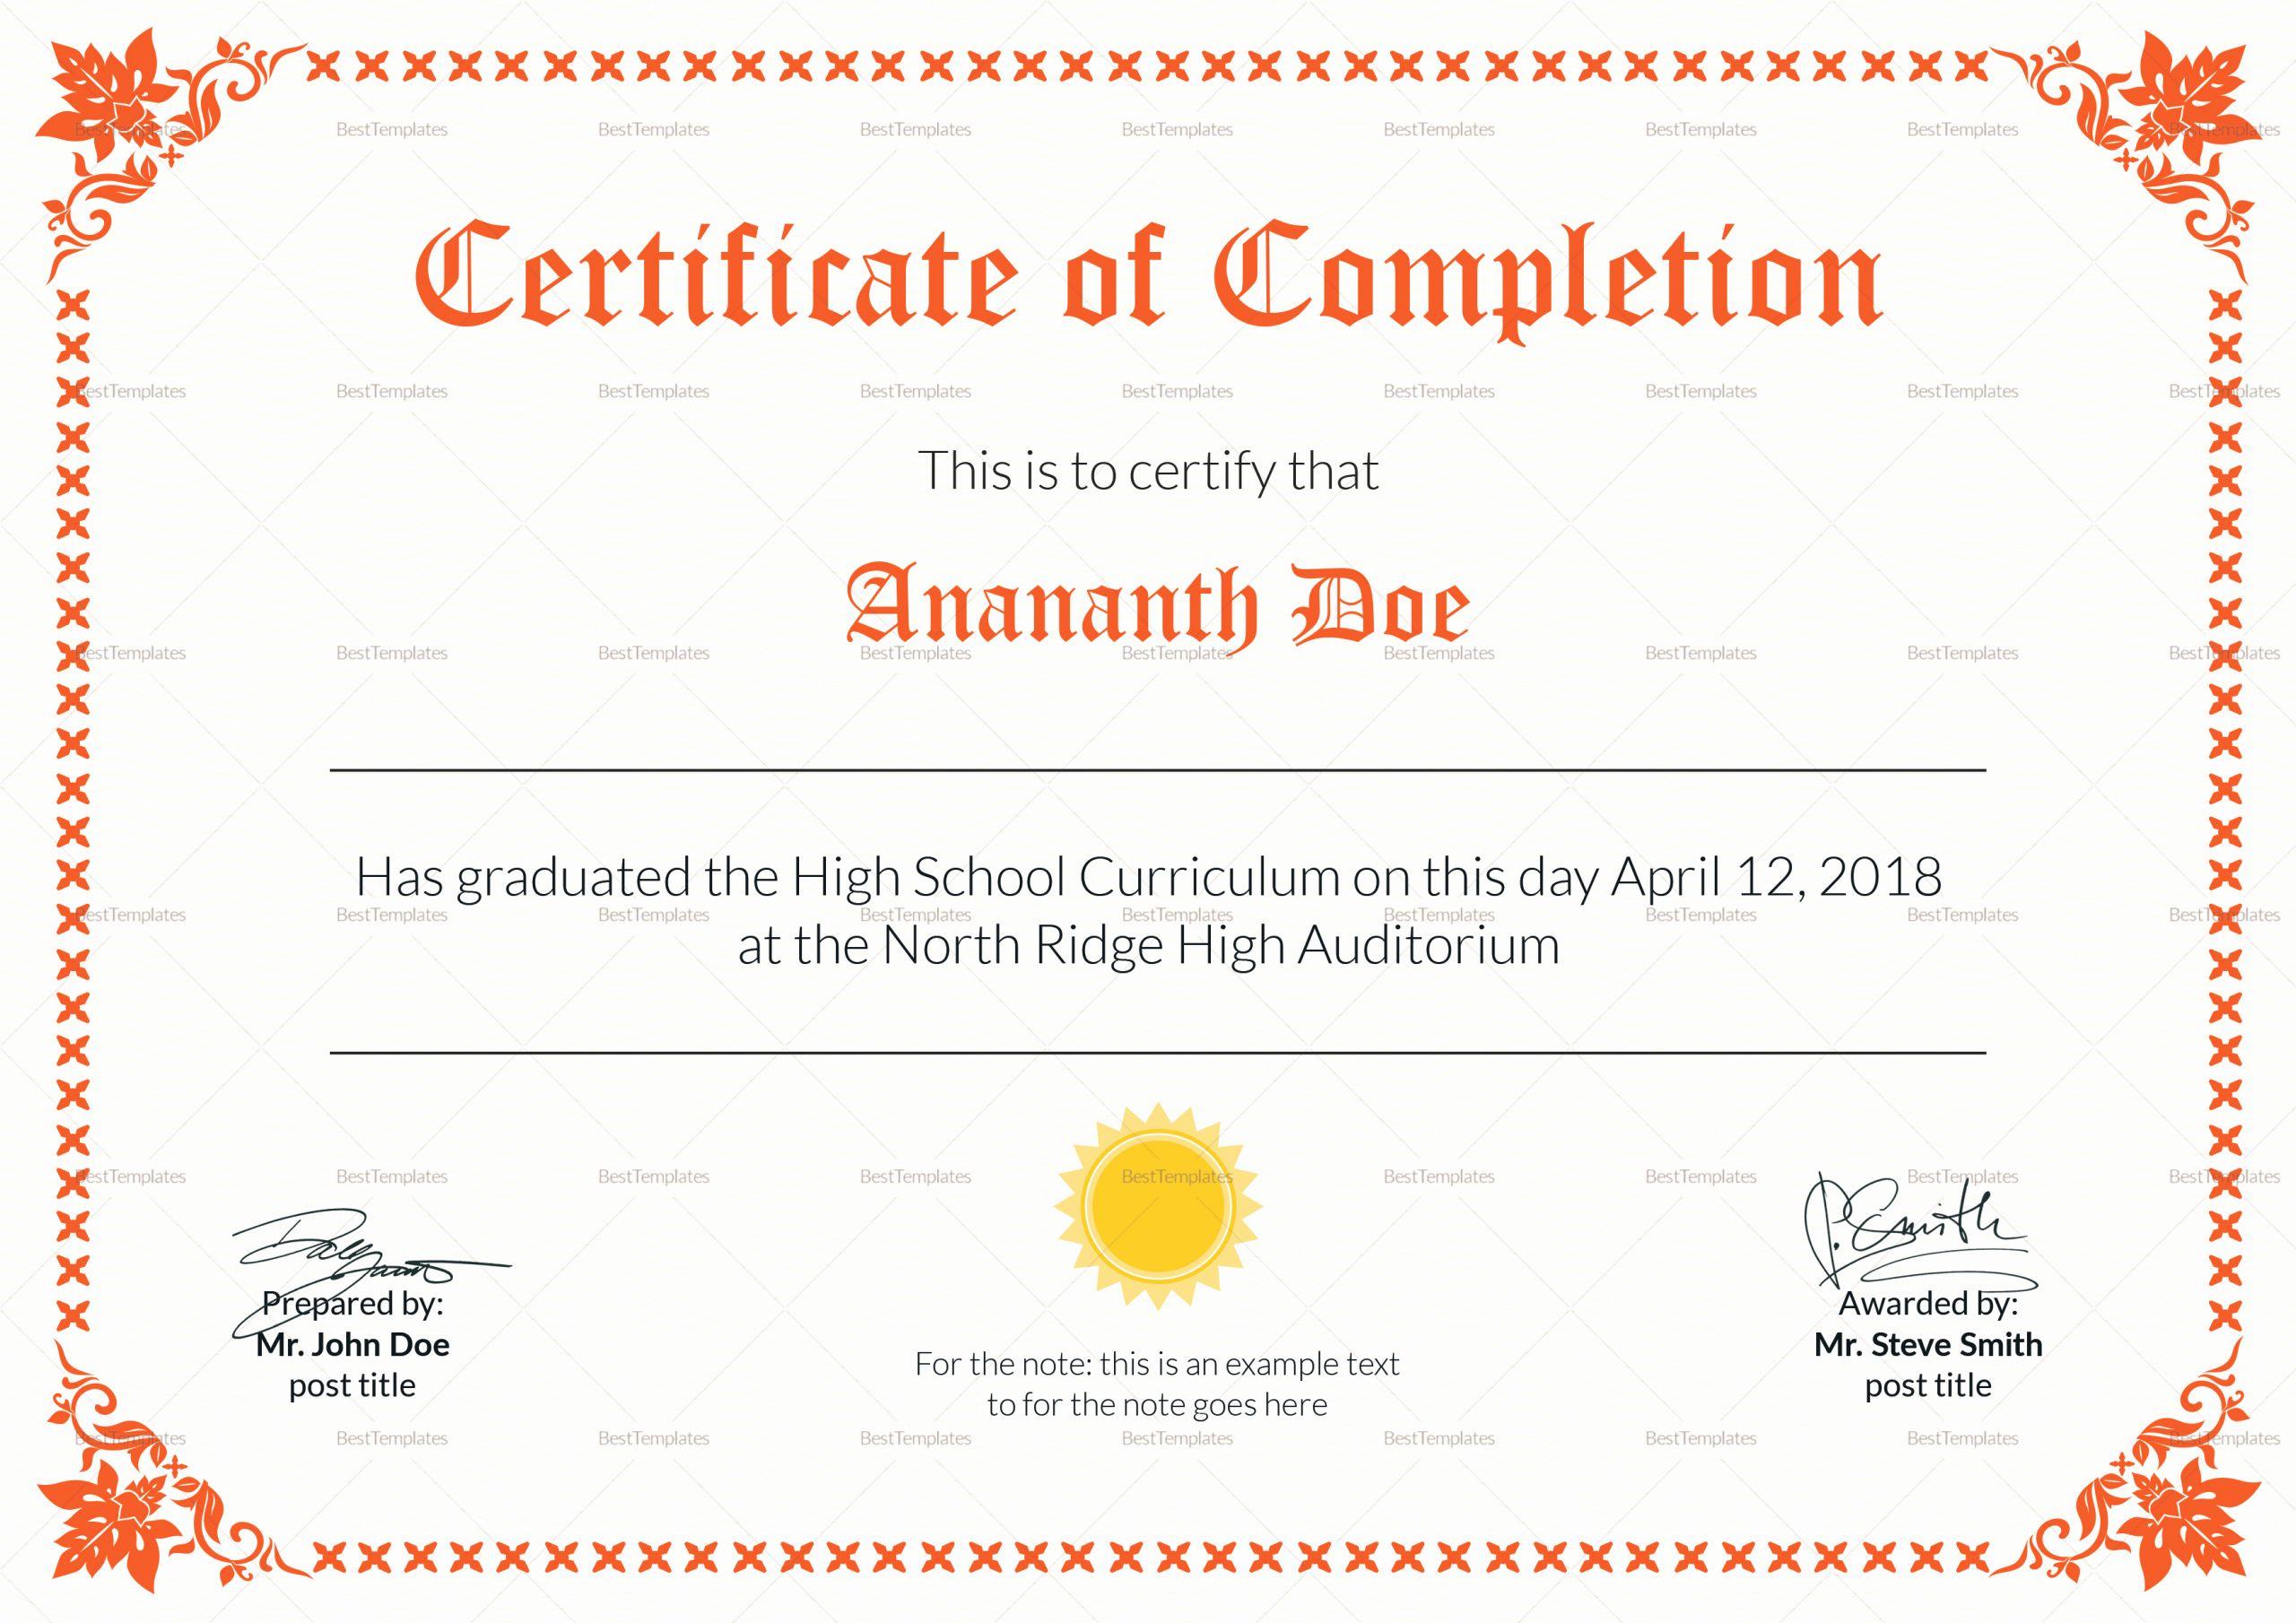 High School Certificate Template Best Of High School Diploma Certificate Design Template In Psd Word